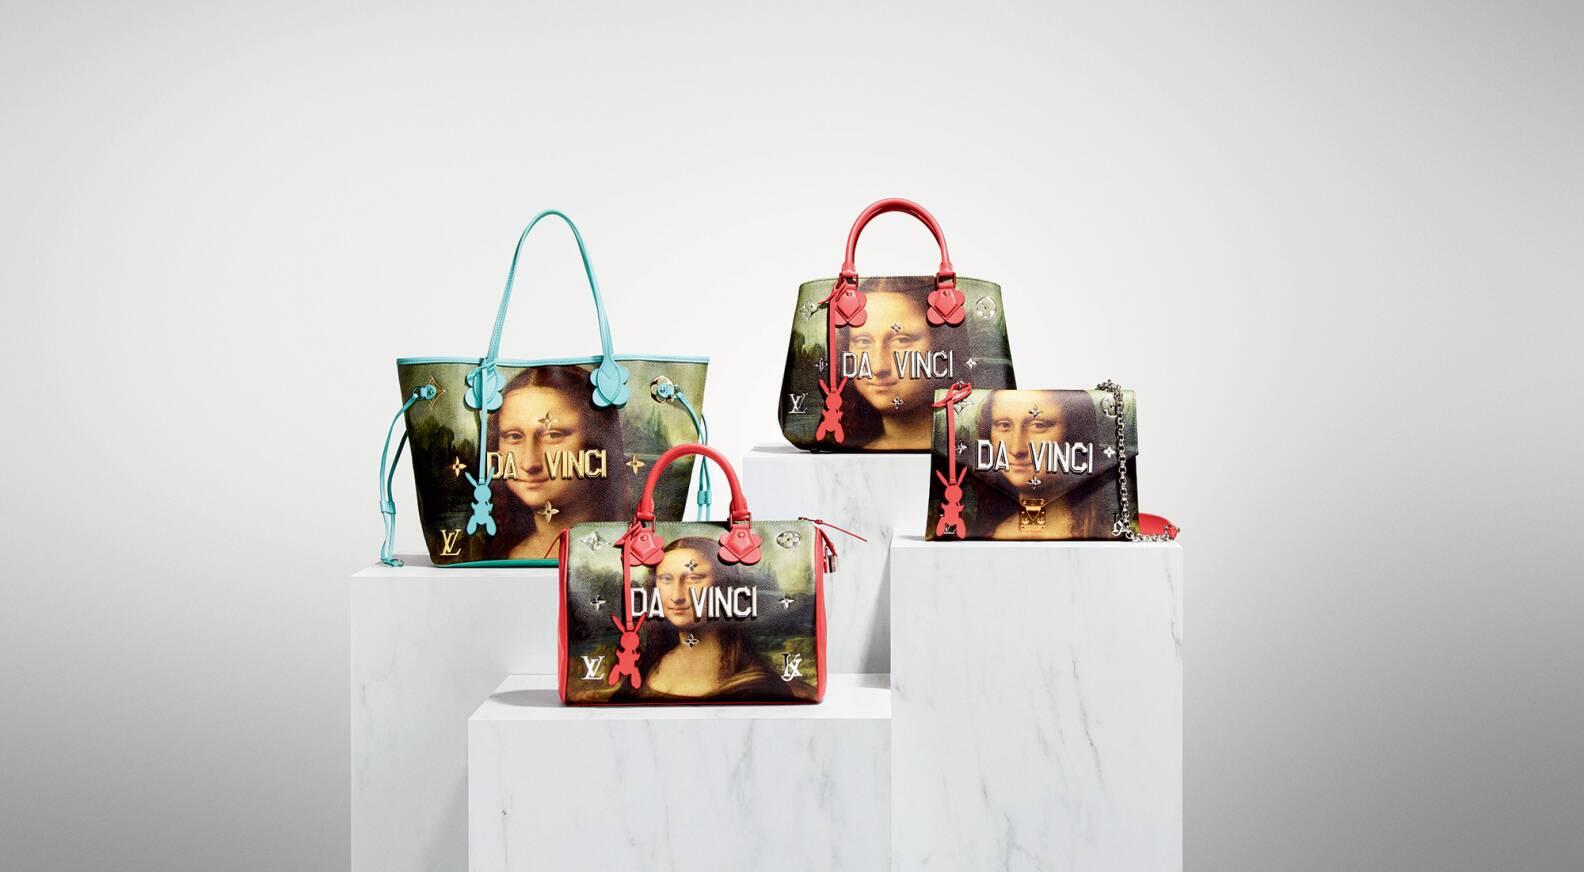 cfb2ccbf4ad1 Louis Vuitton unveils Masters